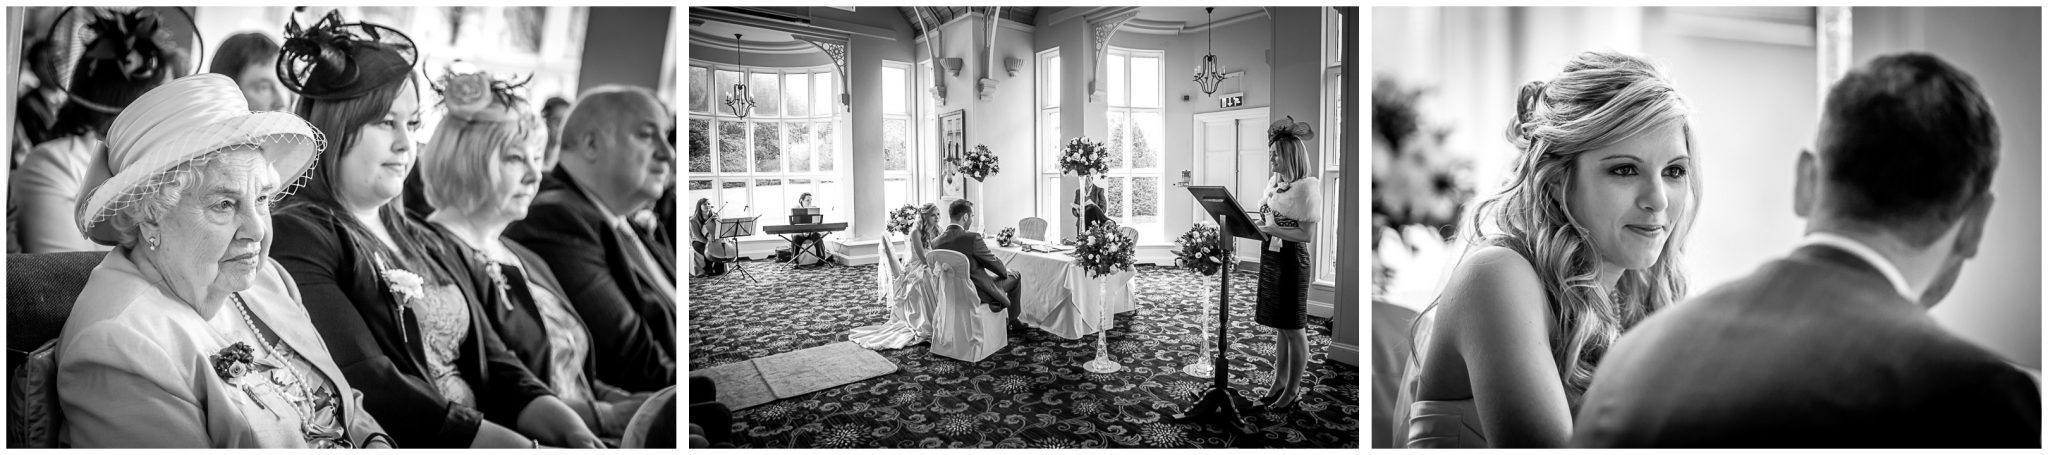 Audleys Wood wedding photography ceremony black and white photos